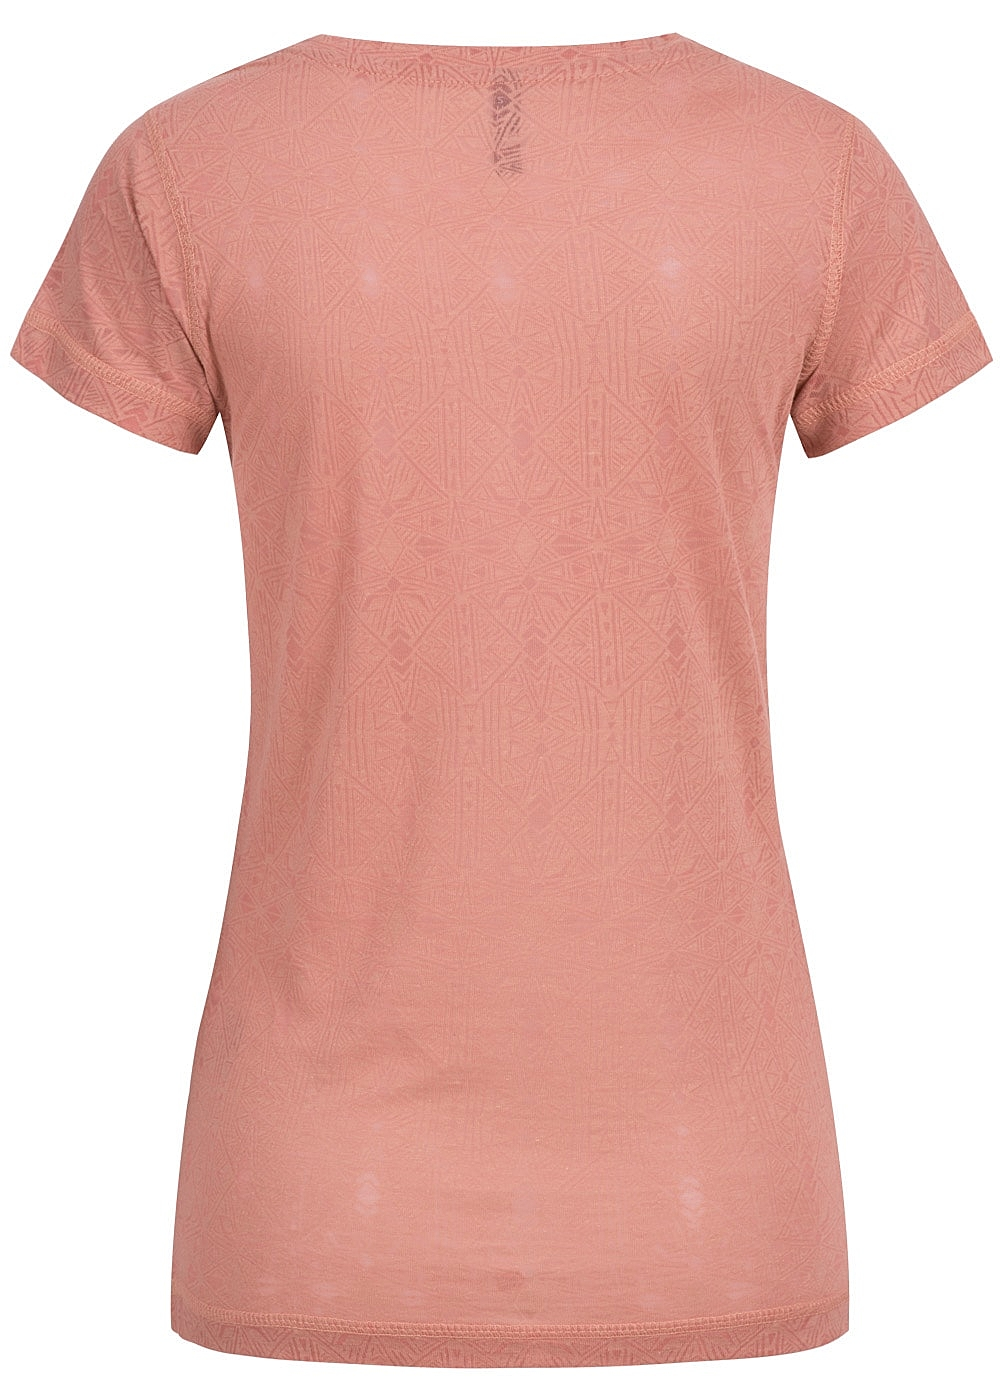 eight2nine damen t shirt knopfleiste by sublevel dark rose rosa 77onlineshop. Black Bedroom Furniture Sets. Home Design Ideas